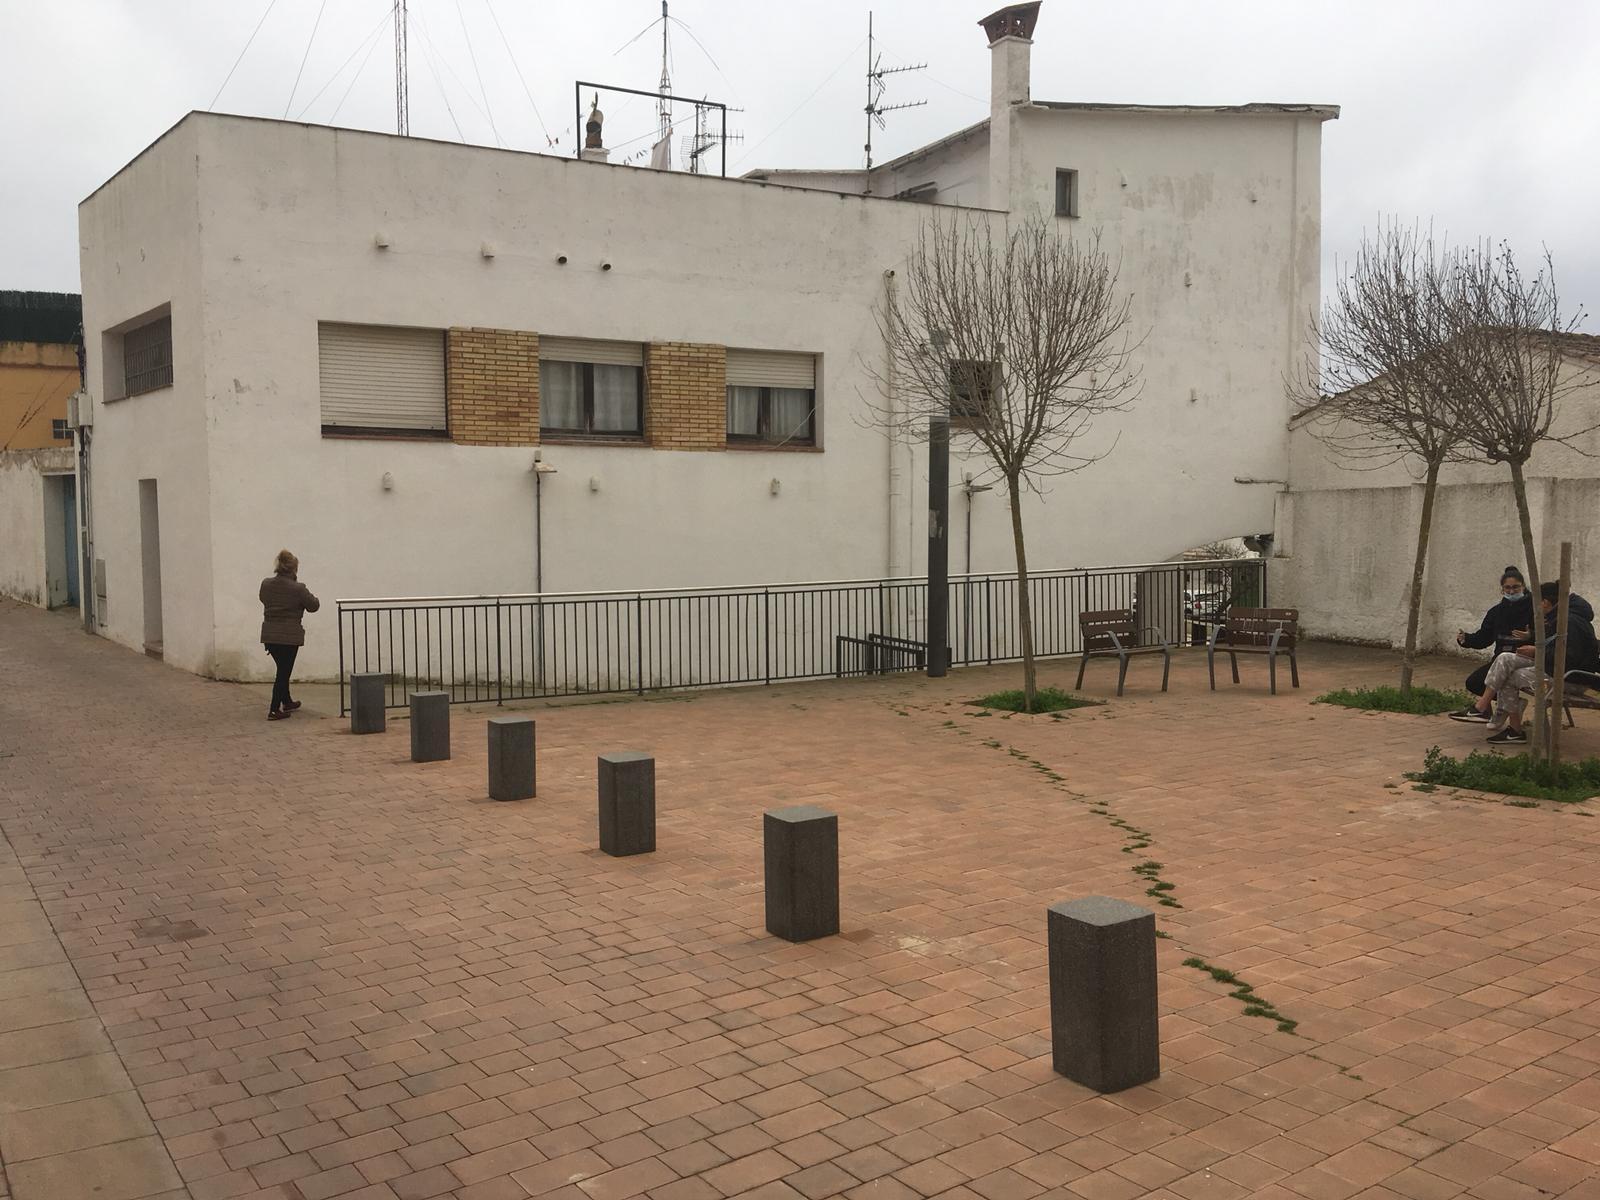 Imagen 3 Casa Adosada en venta en Palamós / Casa de 4 habitacions al costat de Hospital de Palamos